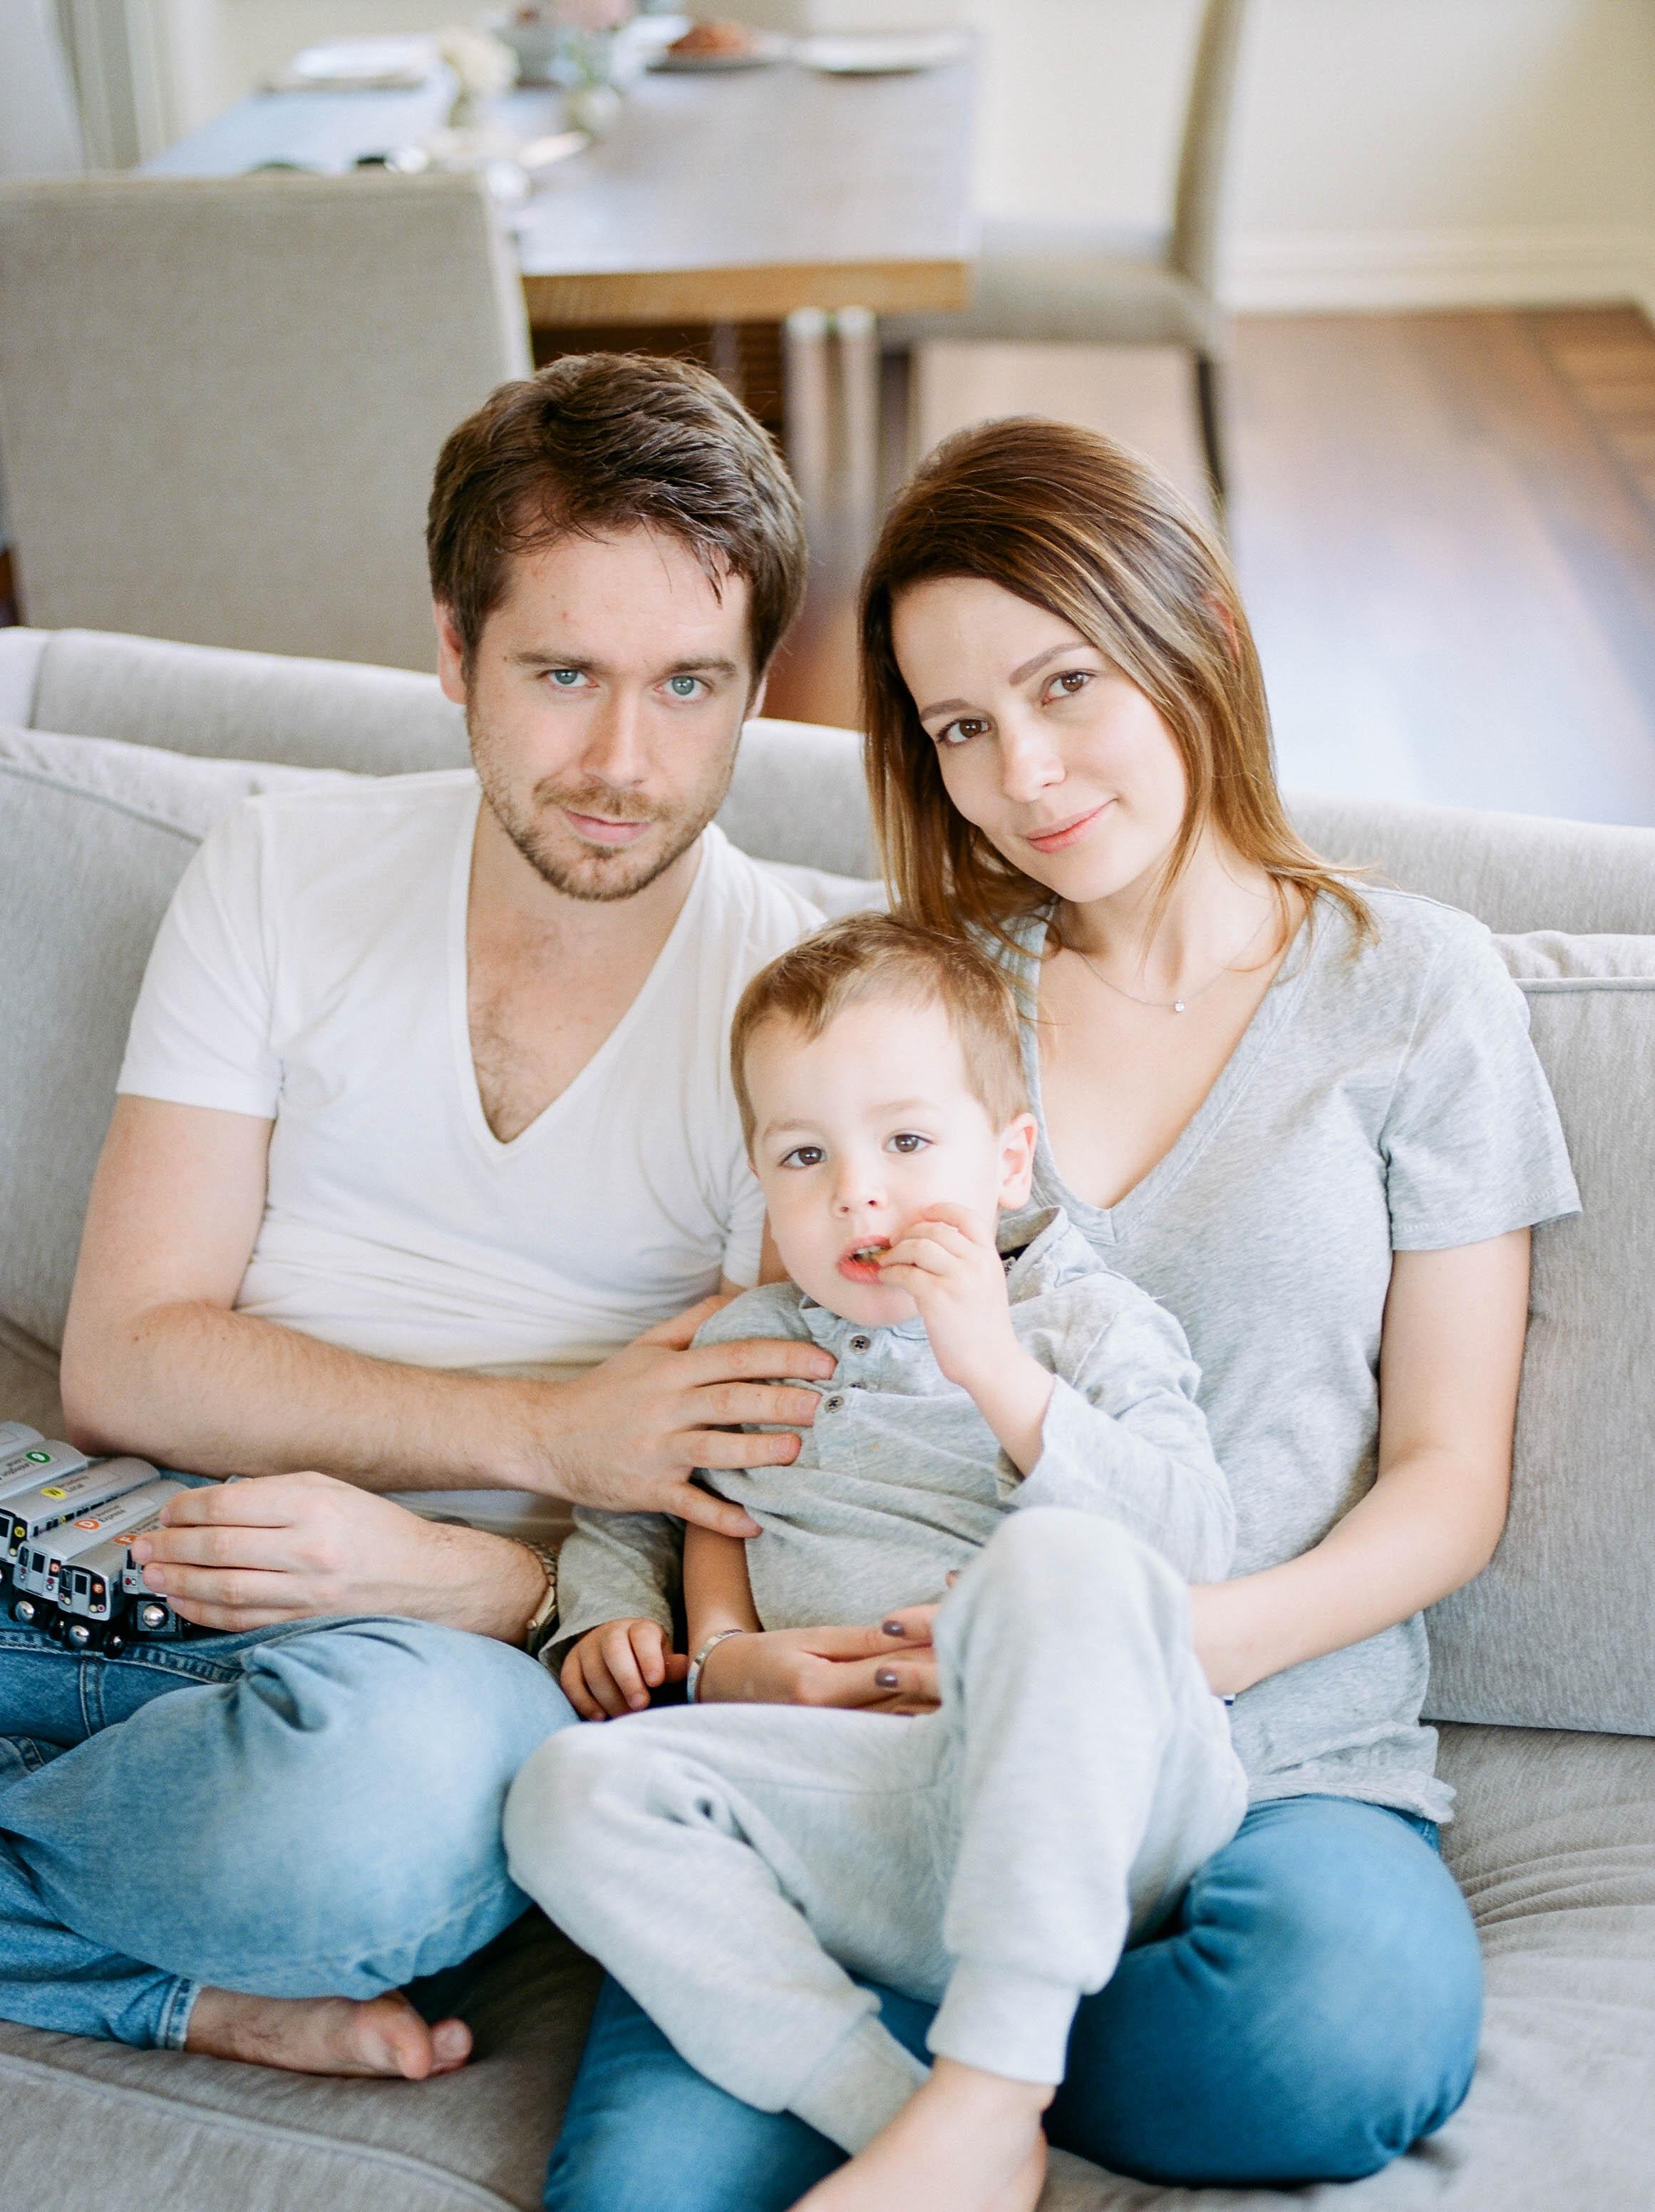 olya_vitulli_photography_ryan-1-45.jpg